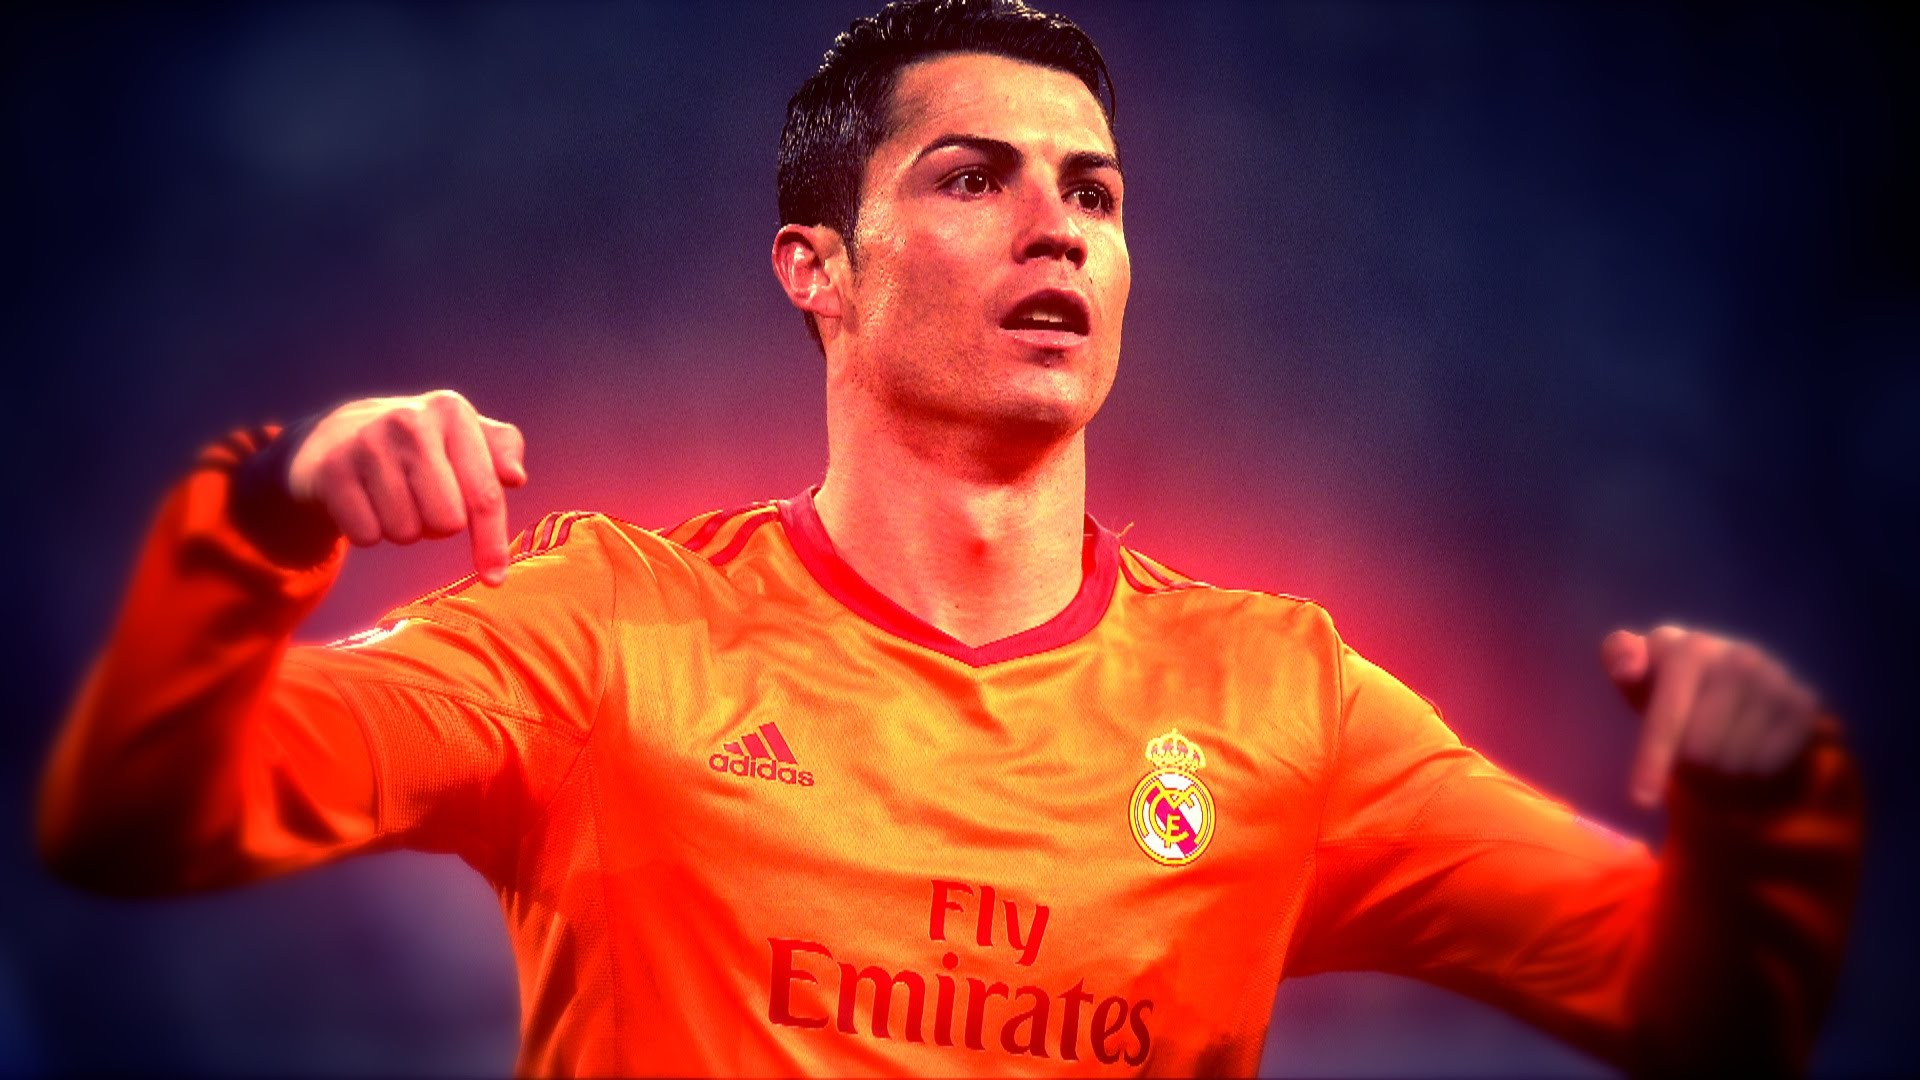 Cristiano Ronaldo HD Wallpapers Free Download Free HD ...